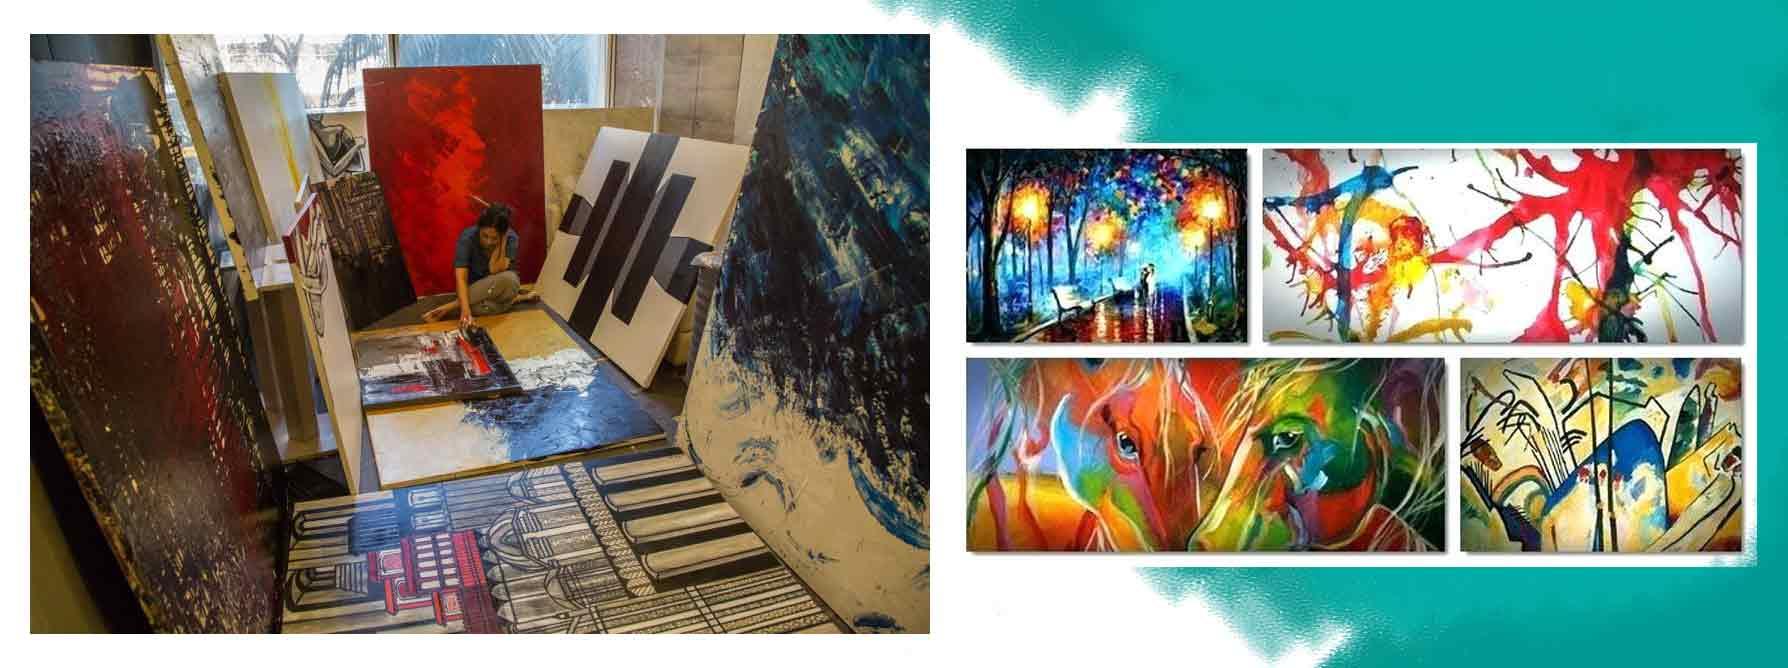 professiona1 photographe16a - ۹۹ روش برای فروش آثار هنری